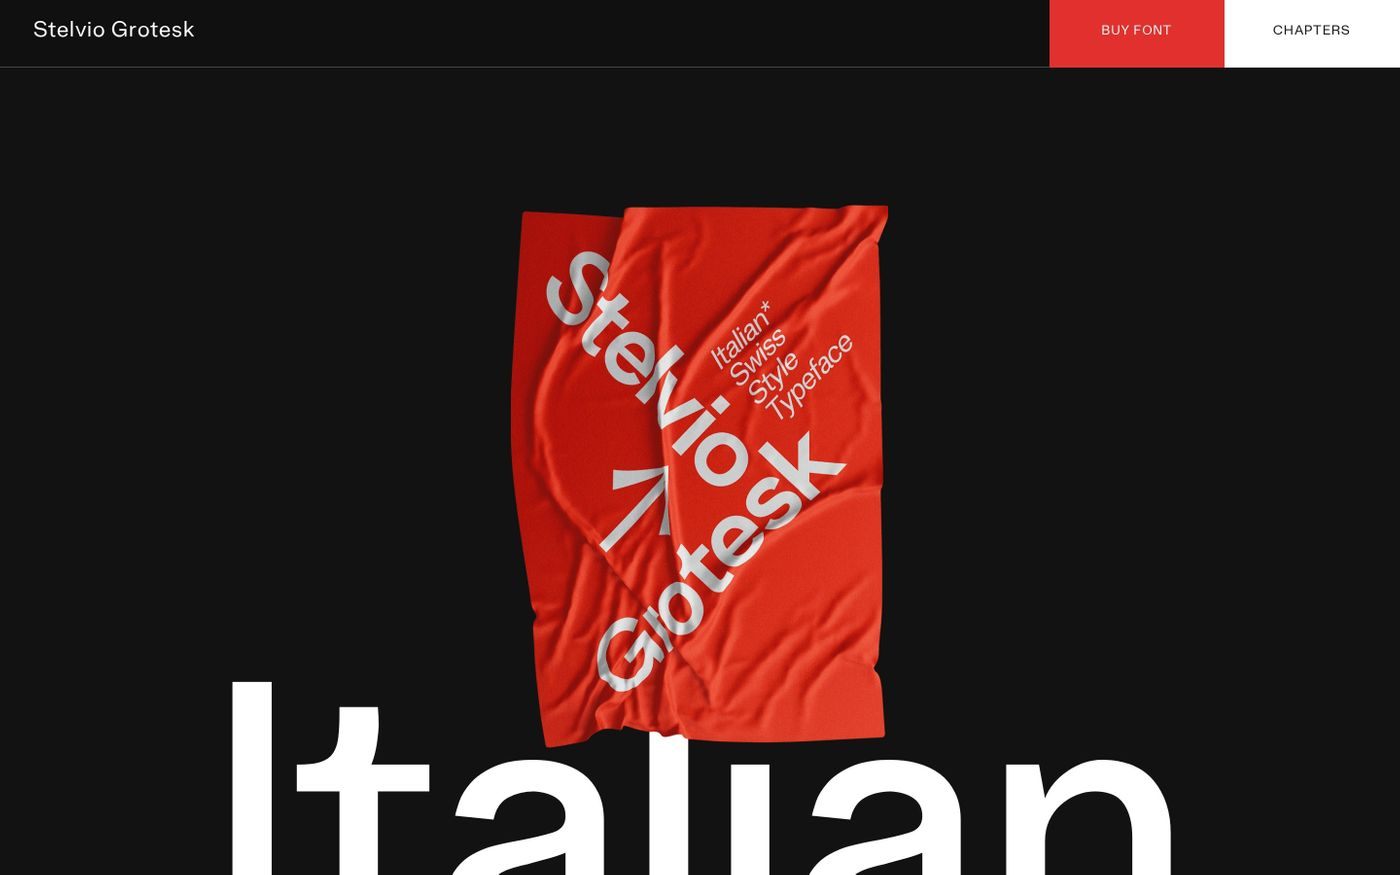 Screenshot of Stelvio Grotesk - A Italian Swiss Style Typeface website